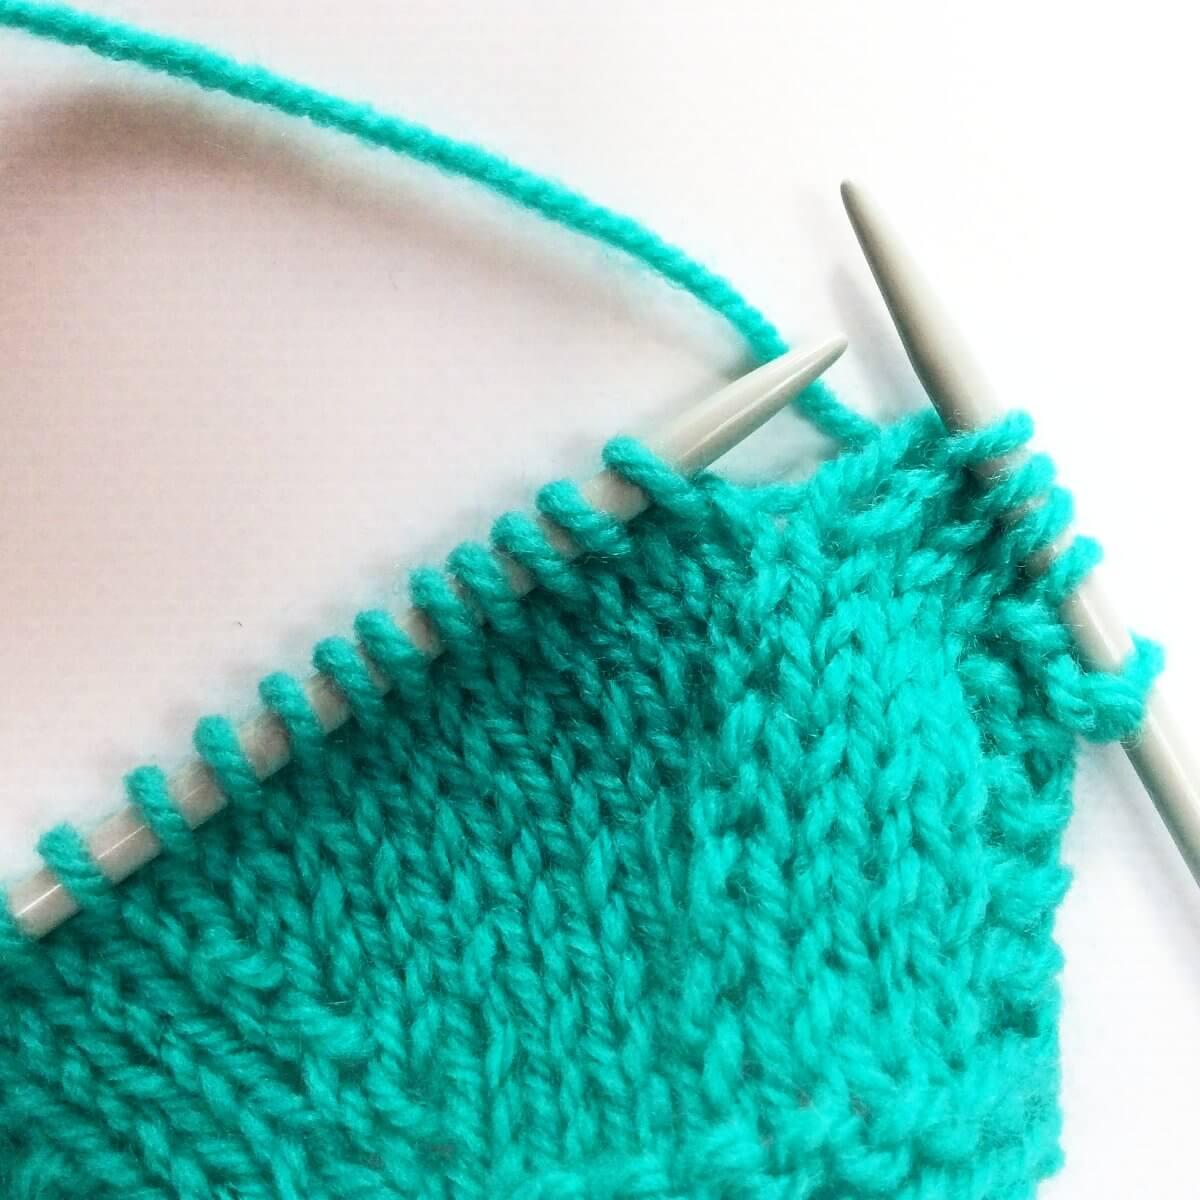 Knitting Decreases Slant Left : Tutorial knitting the skp decrease la visch designs